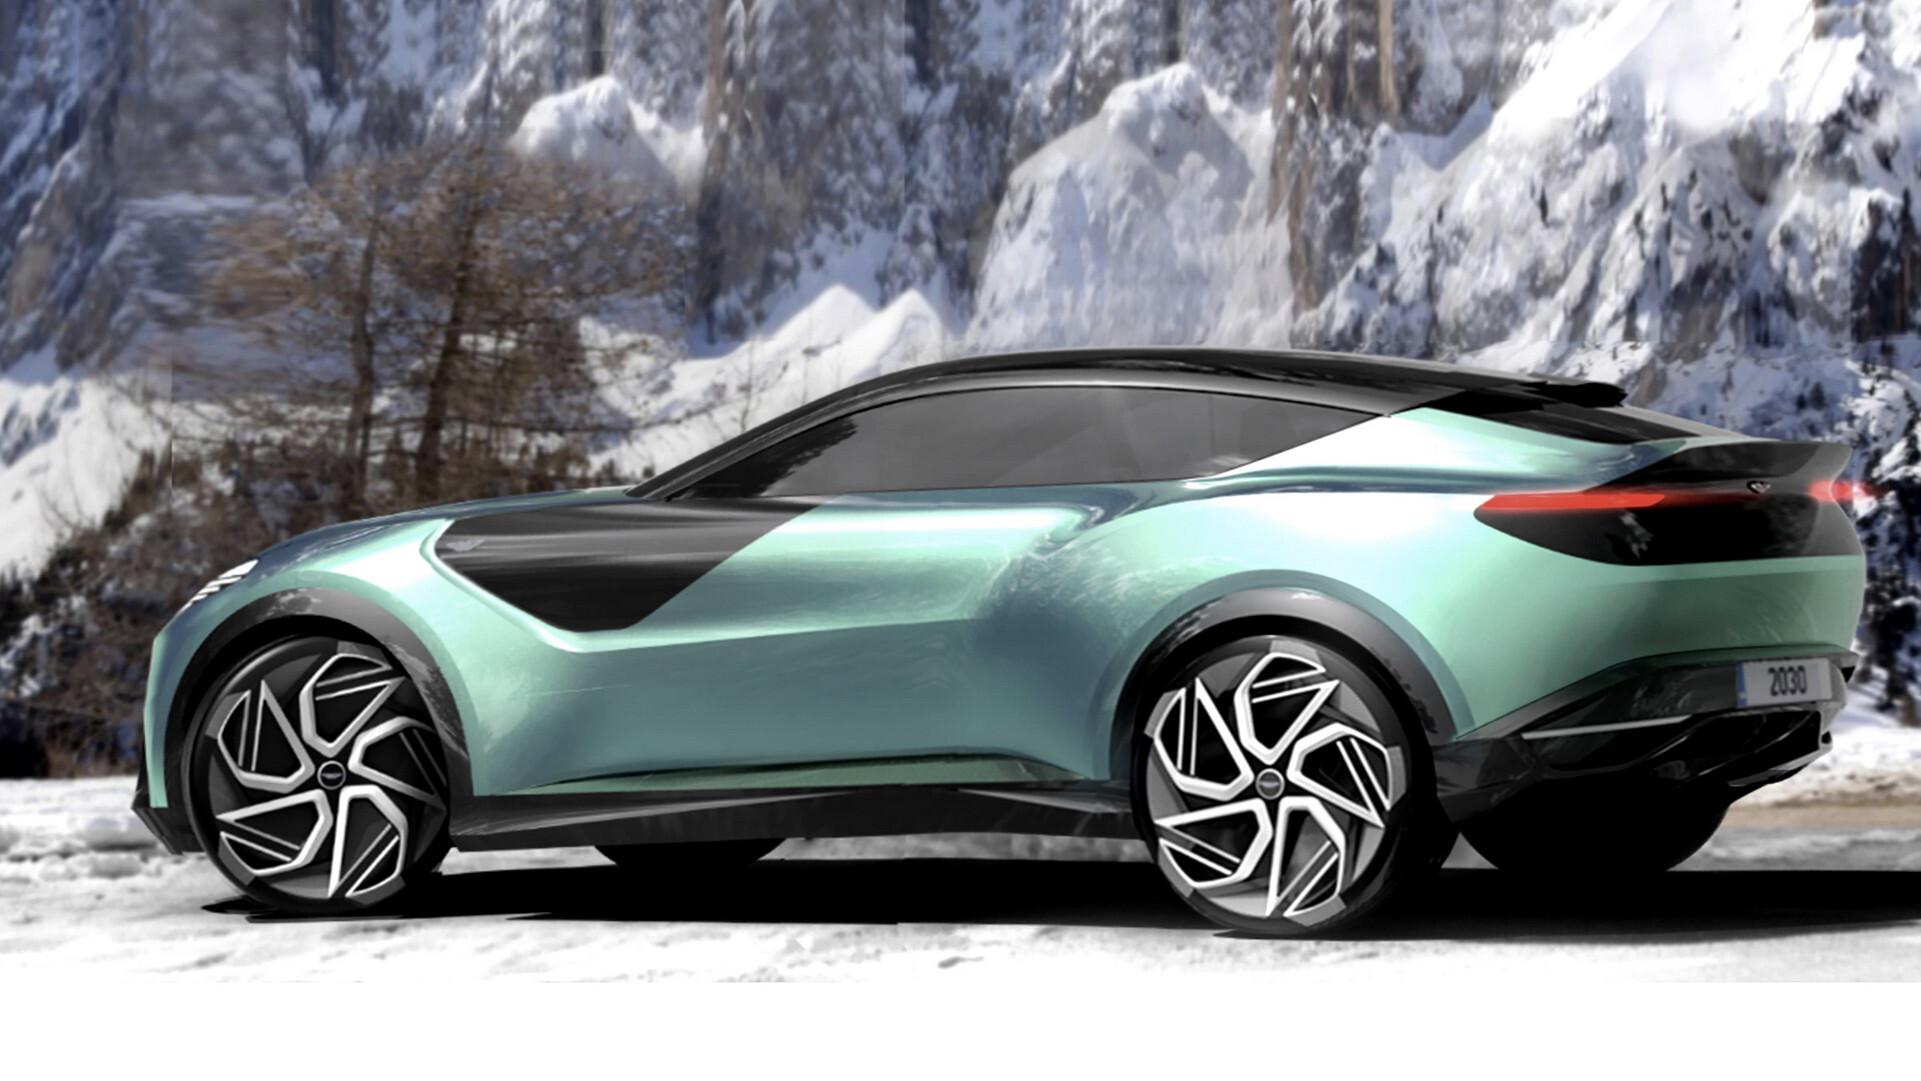 Aston Martin DBX rendered as futuristic EV SUV